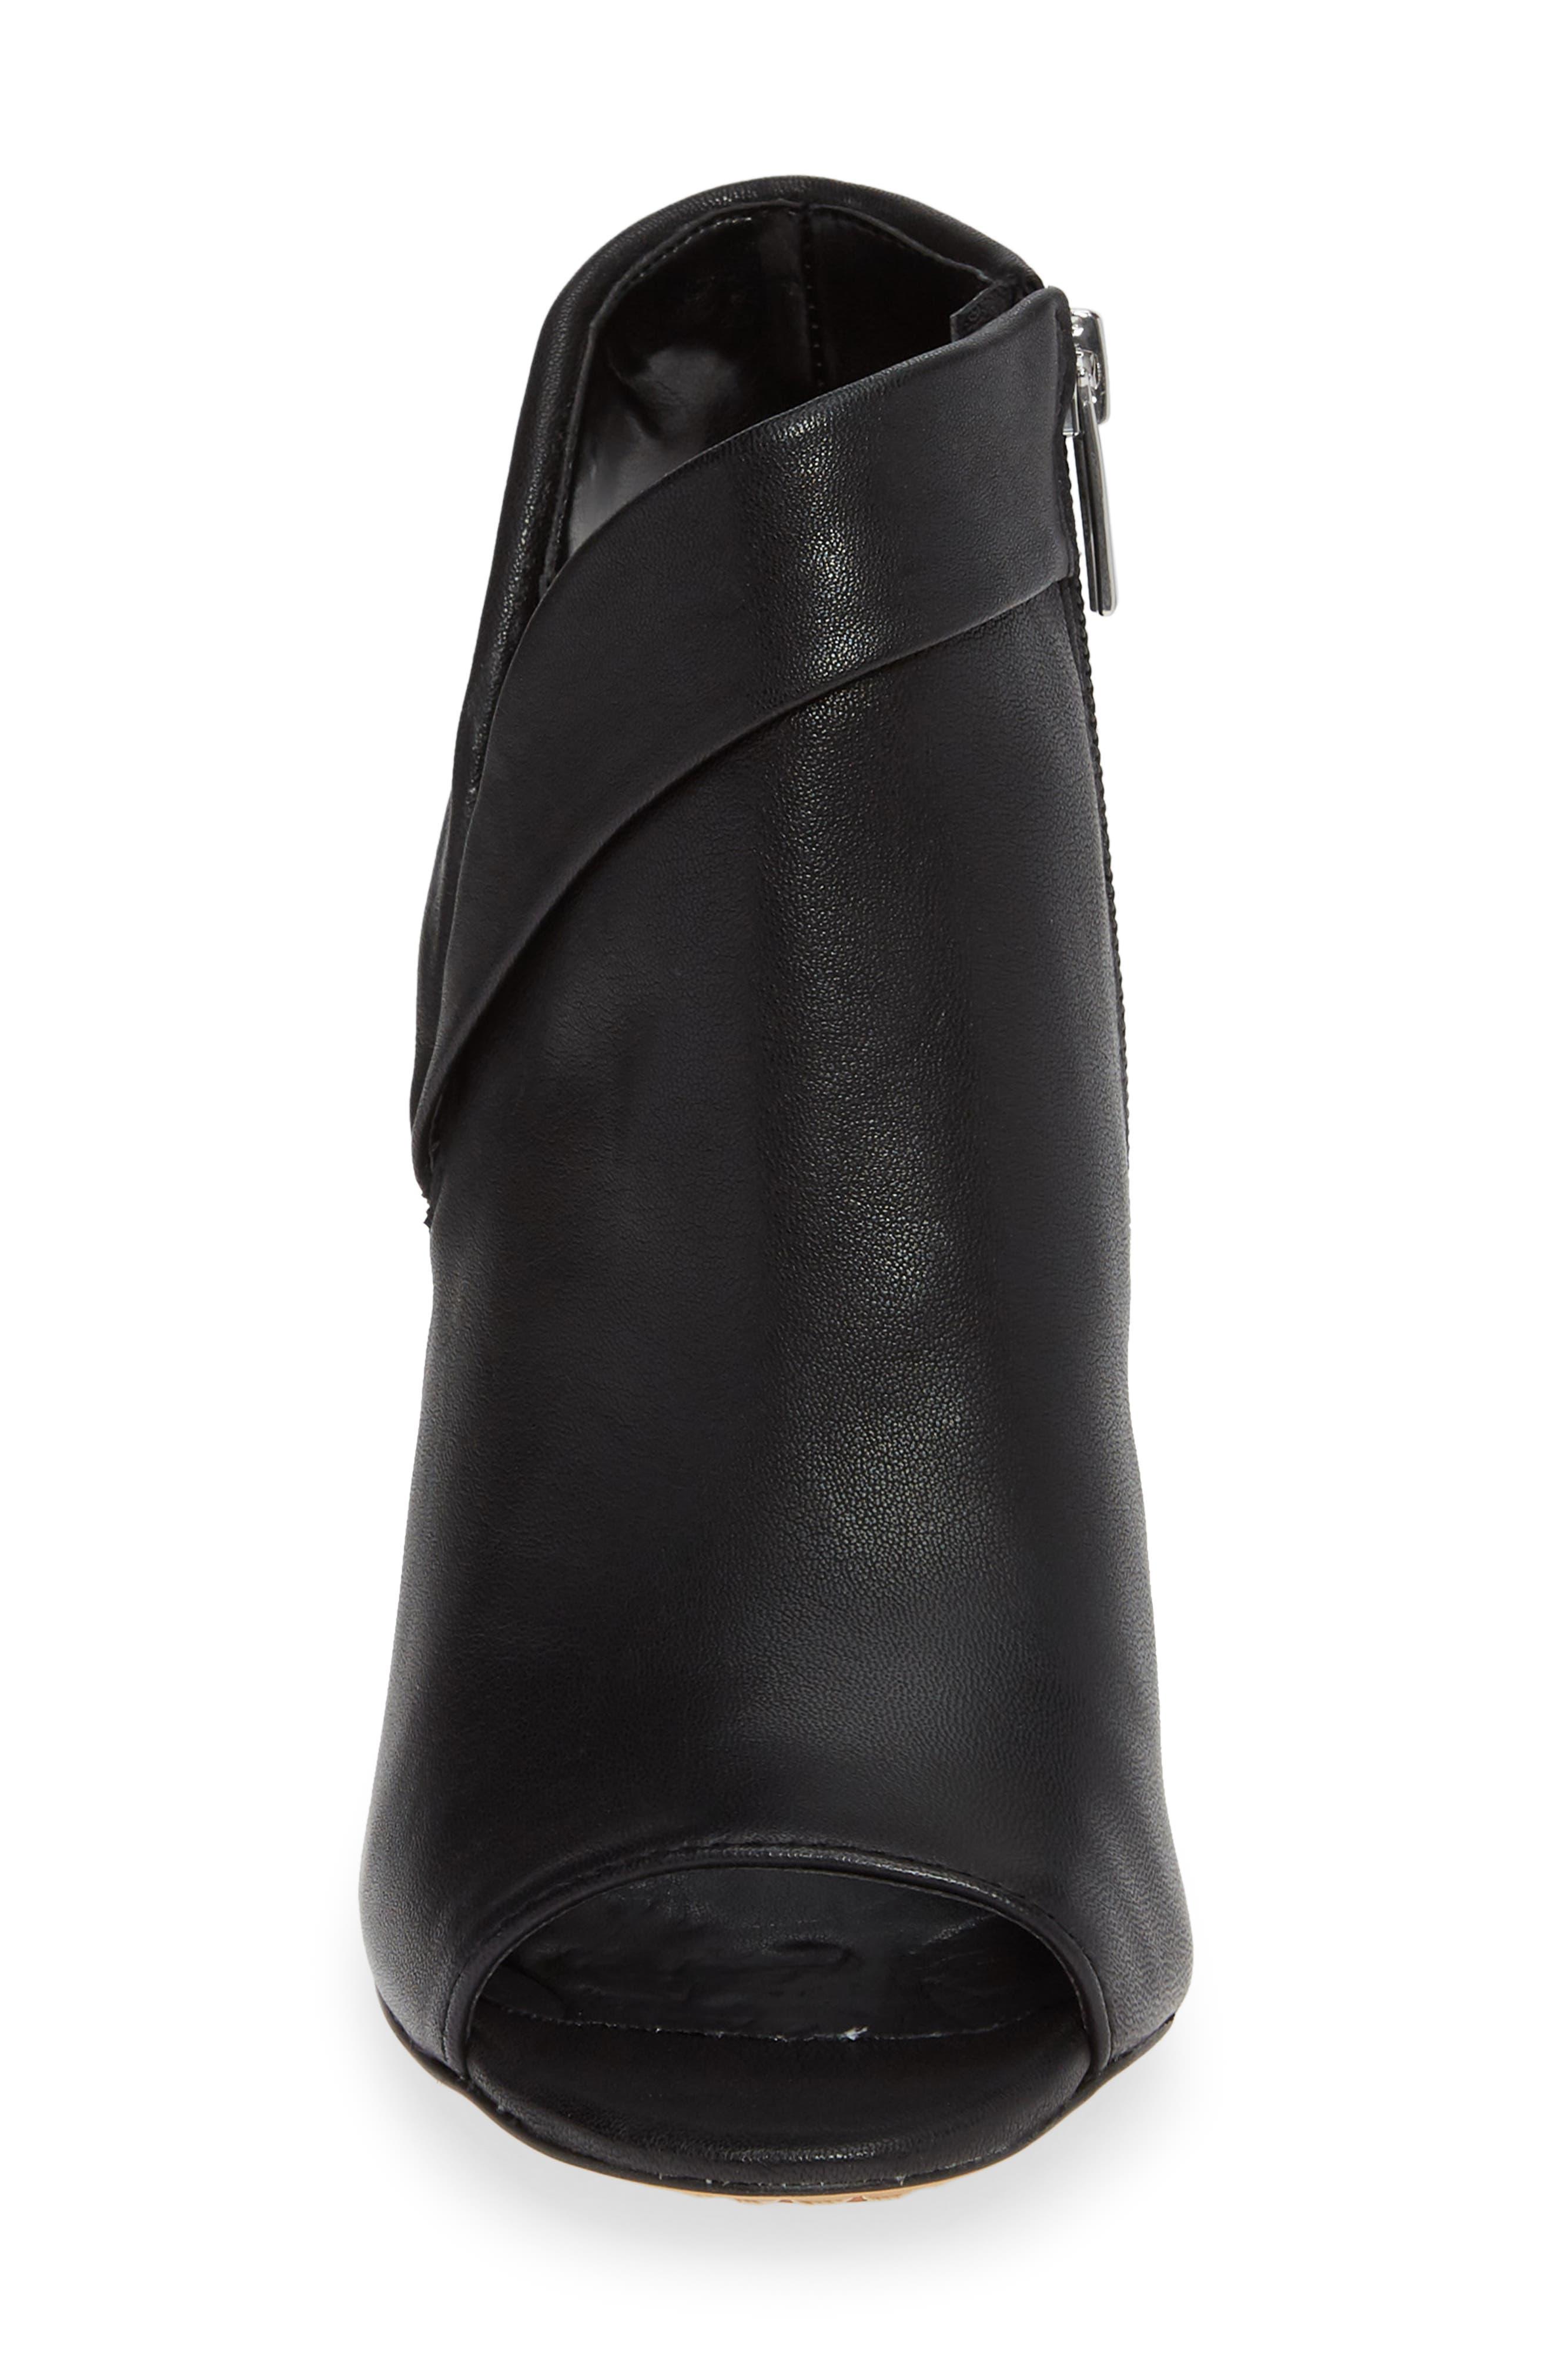 Cholia Asymmetrical Sandal Bootie,                             Alternate thumbnail 4, color,                             BLACK LEATHER